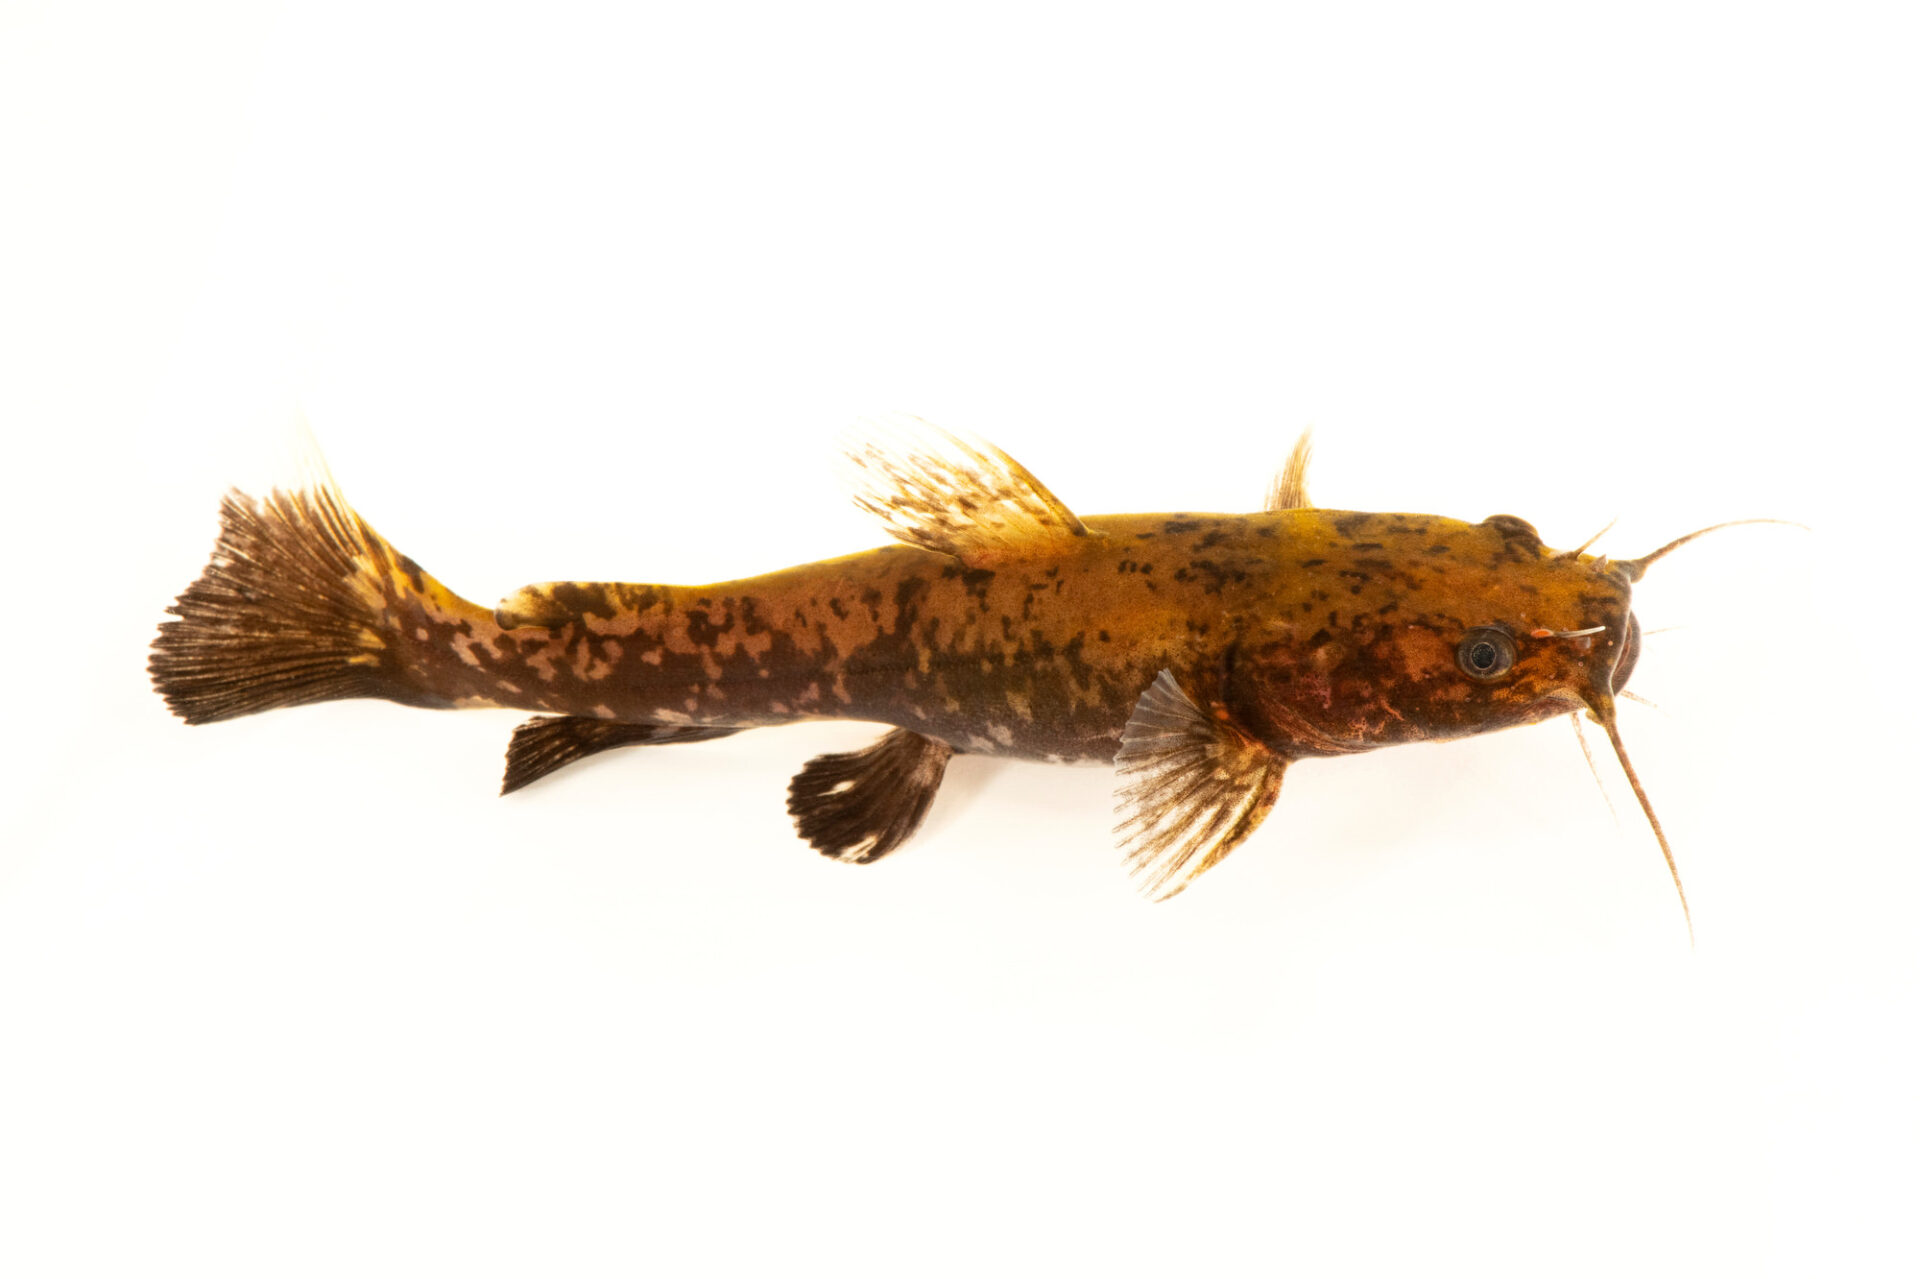 Photo: A juvenile flathead catfish (Pylodictis olivaris) at the Center for Aquatic Mollusk Programs in Lake City, Minnesota.